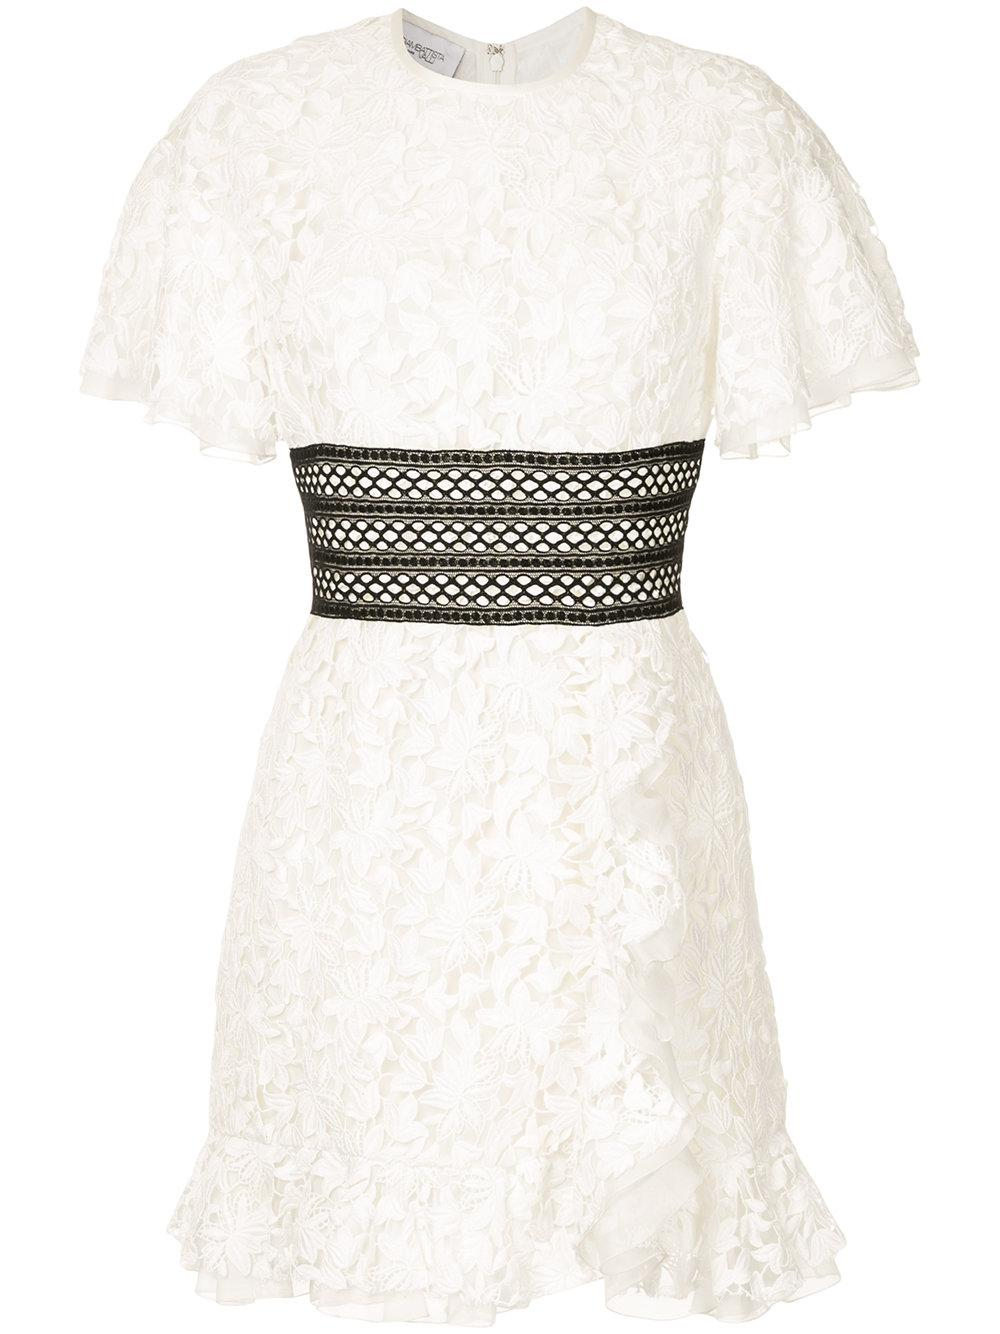 Giambattista Valli Lace Mini Dress